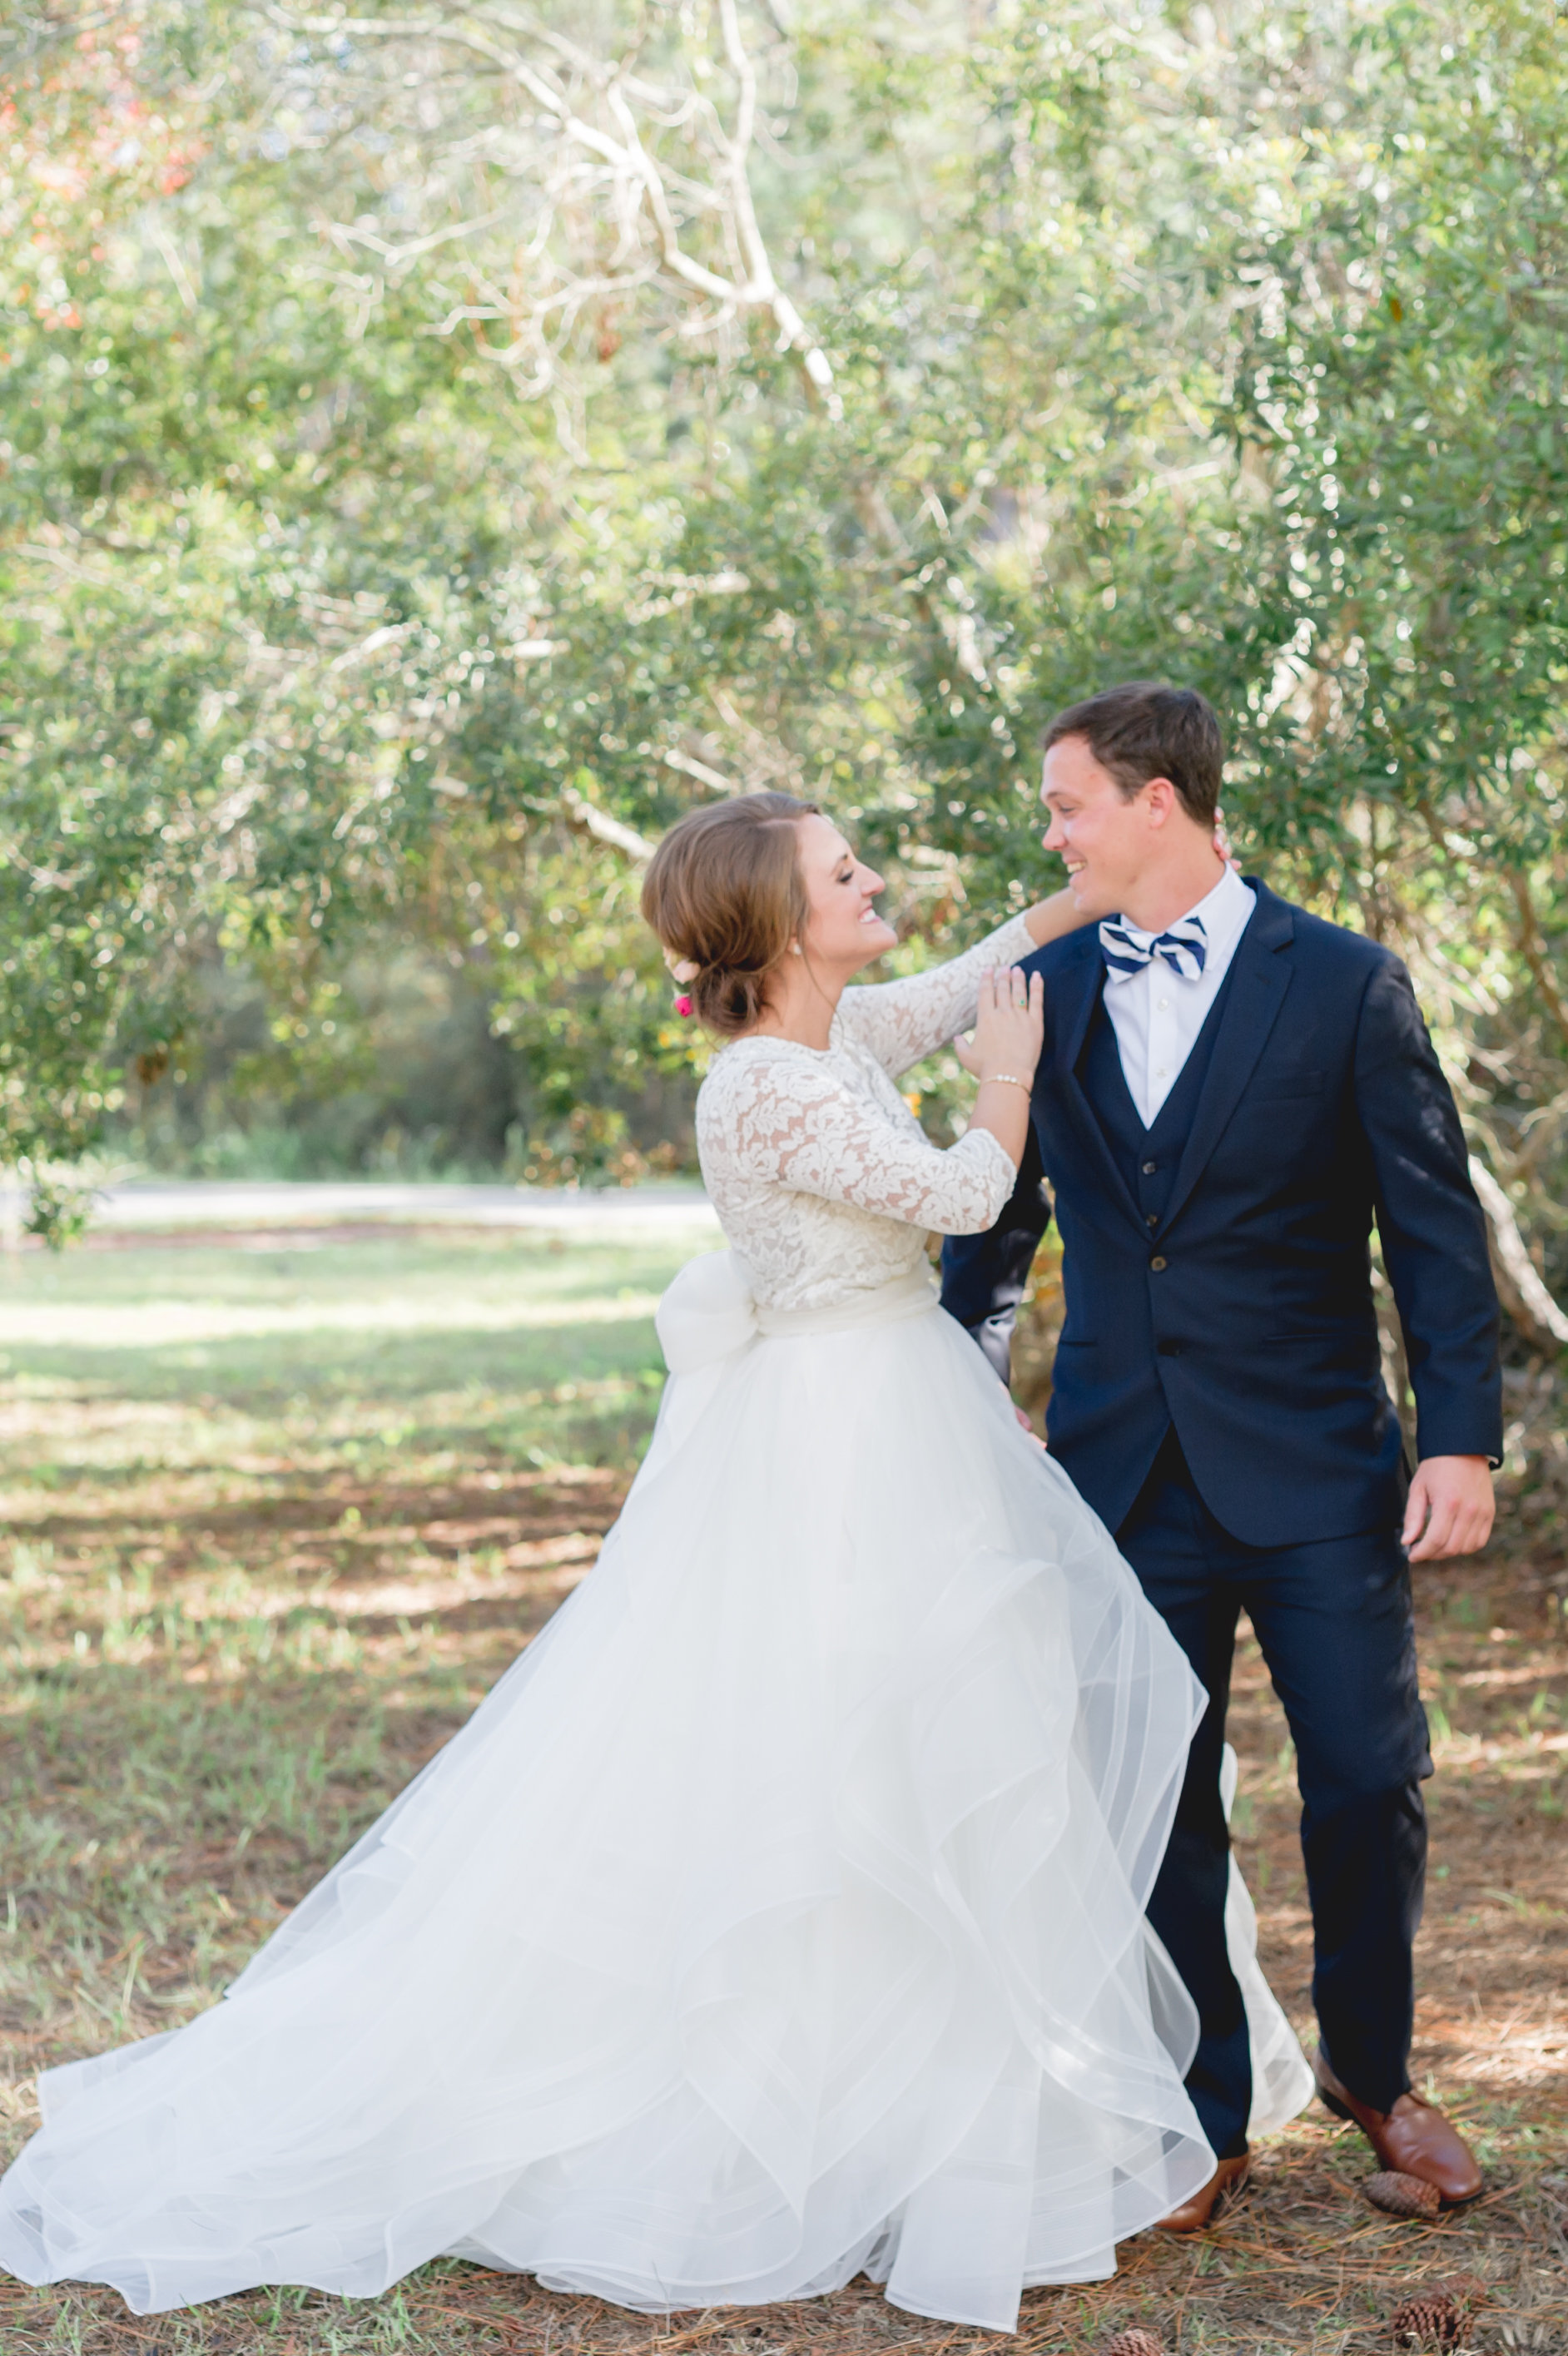 Joe Kendall Romantic Boho Wedding Gulf Shores AL-Bride and Groom-0083.jpg